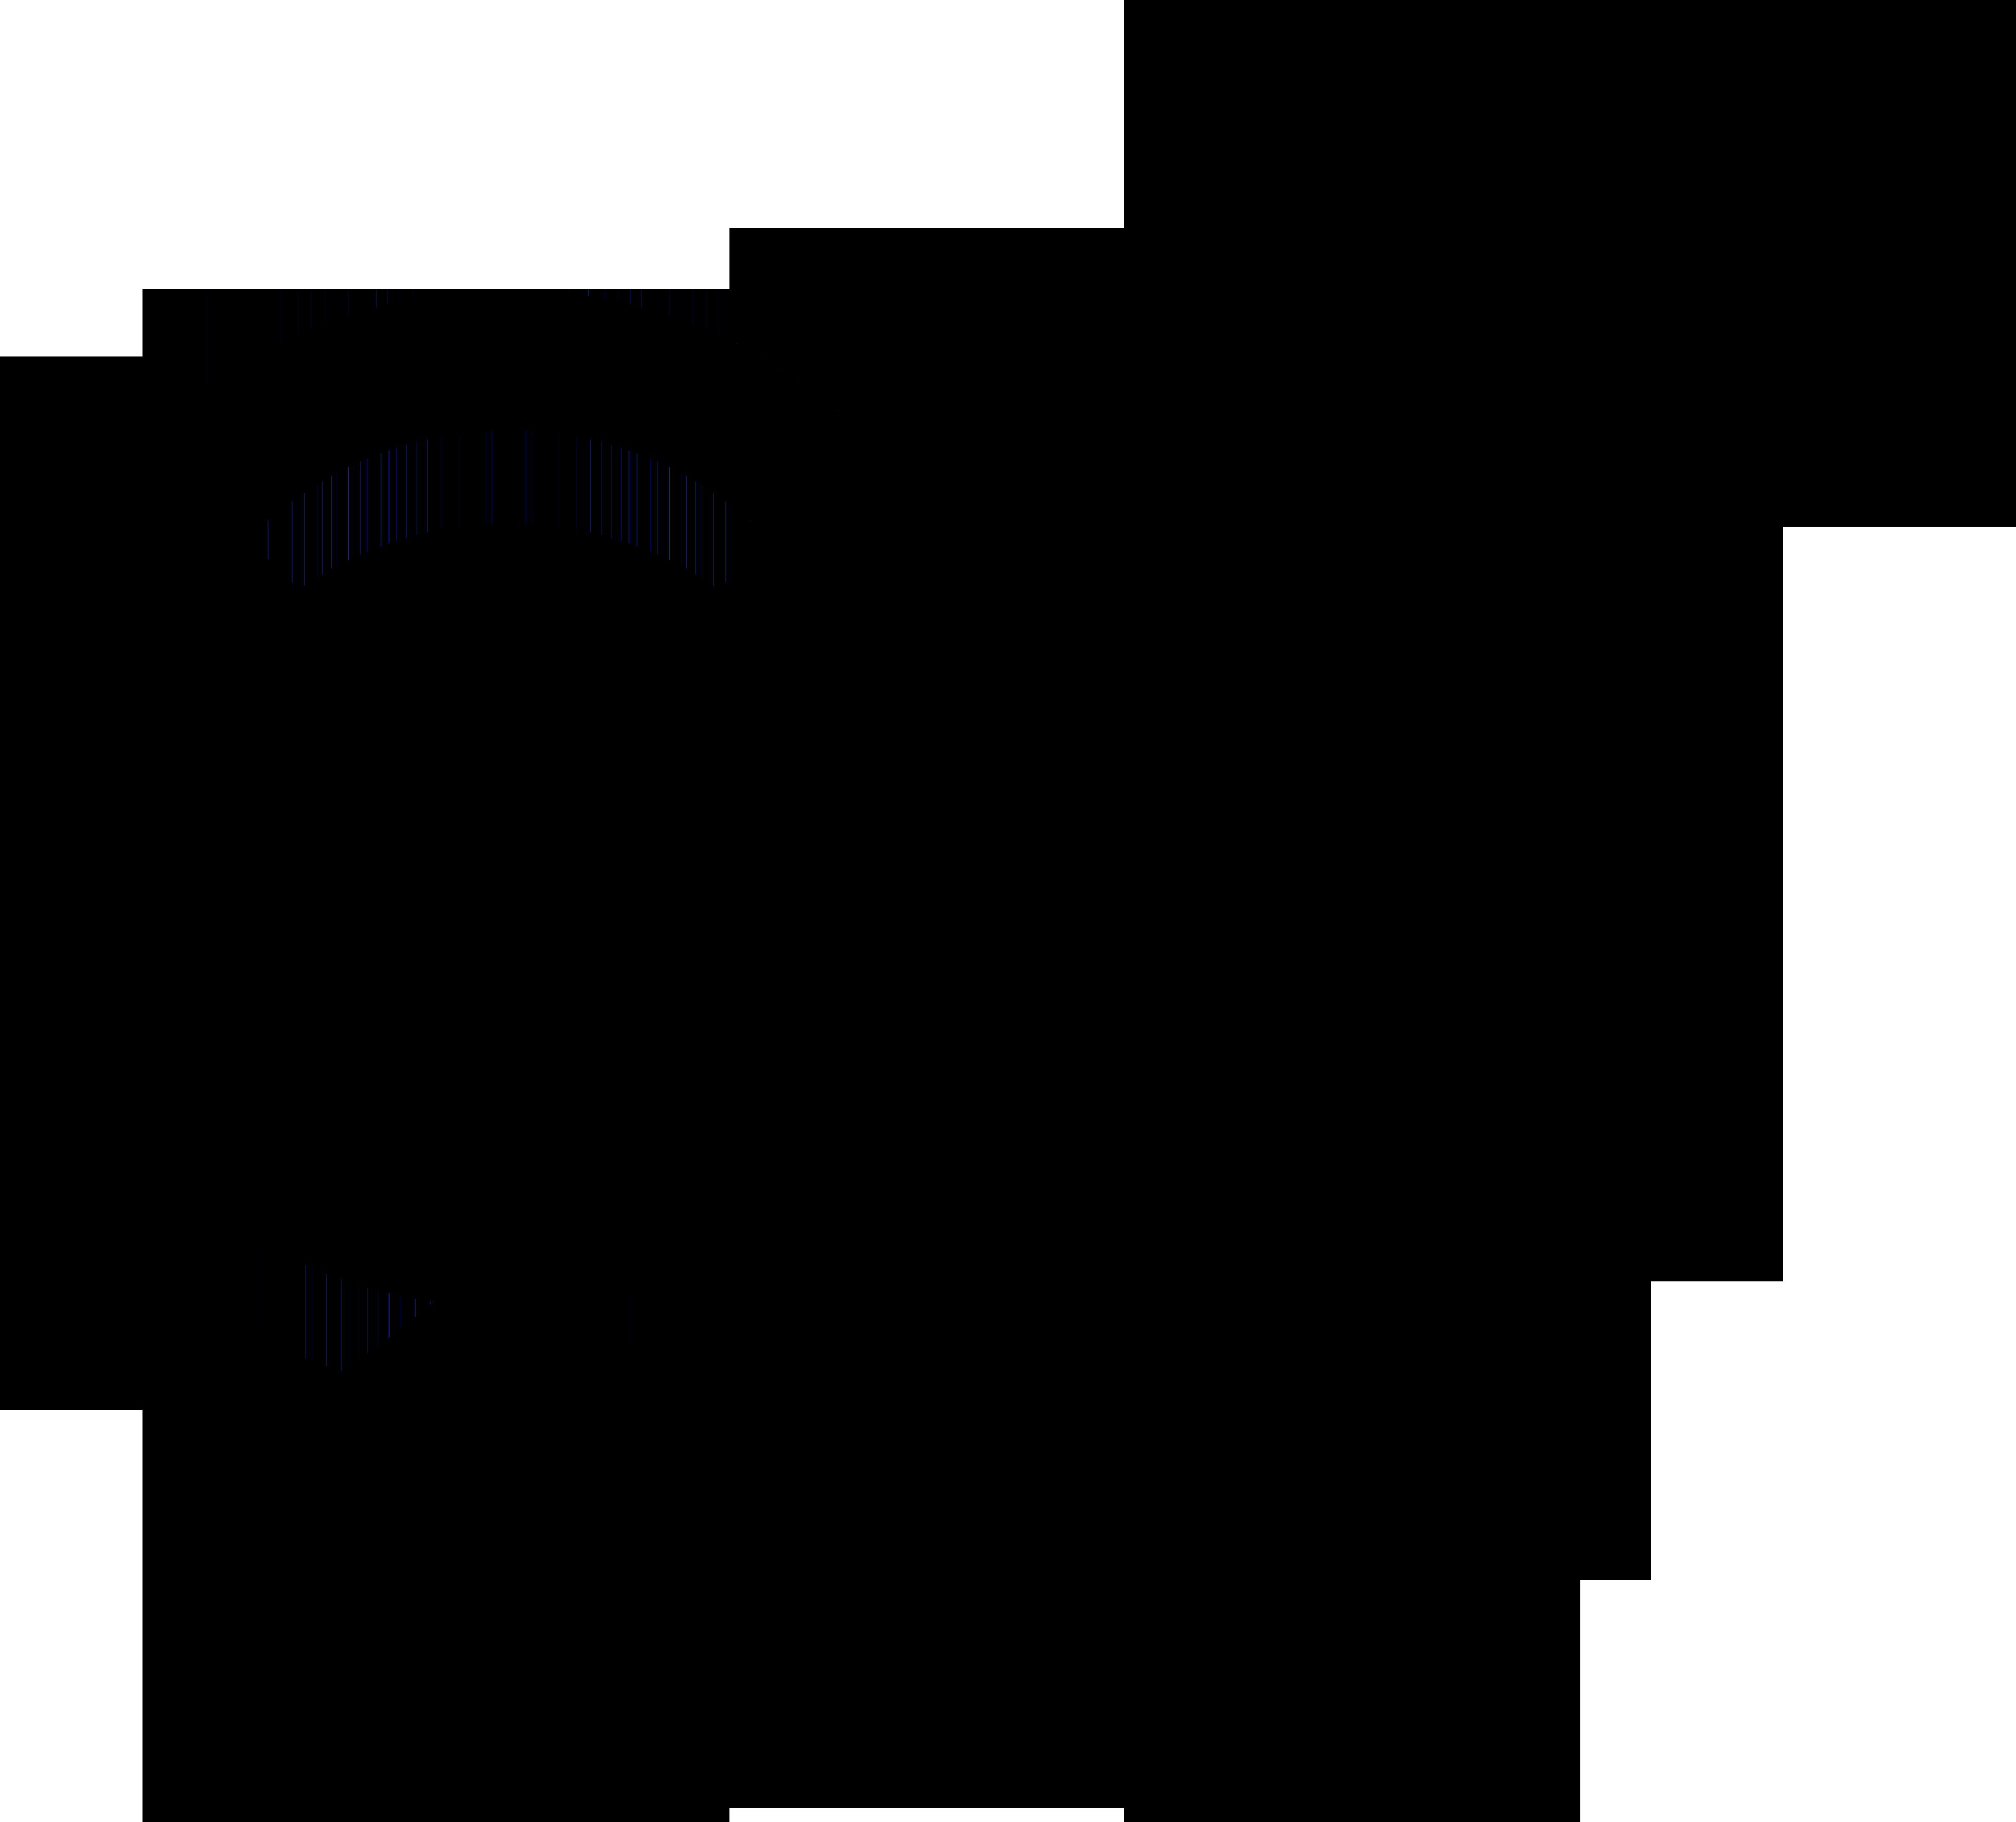 Venus symbol interlocked with a nonbinary man and woman symbol.